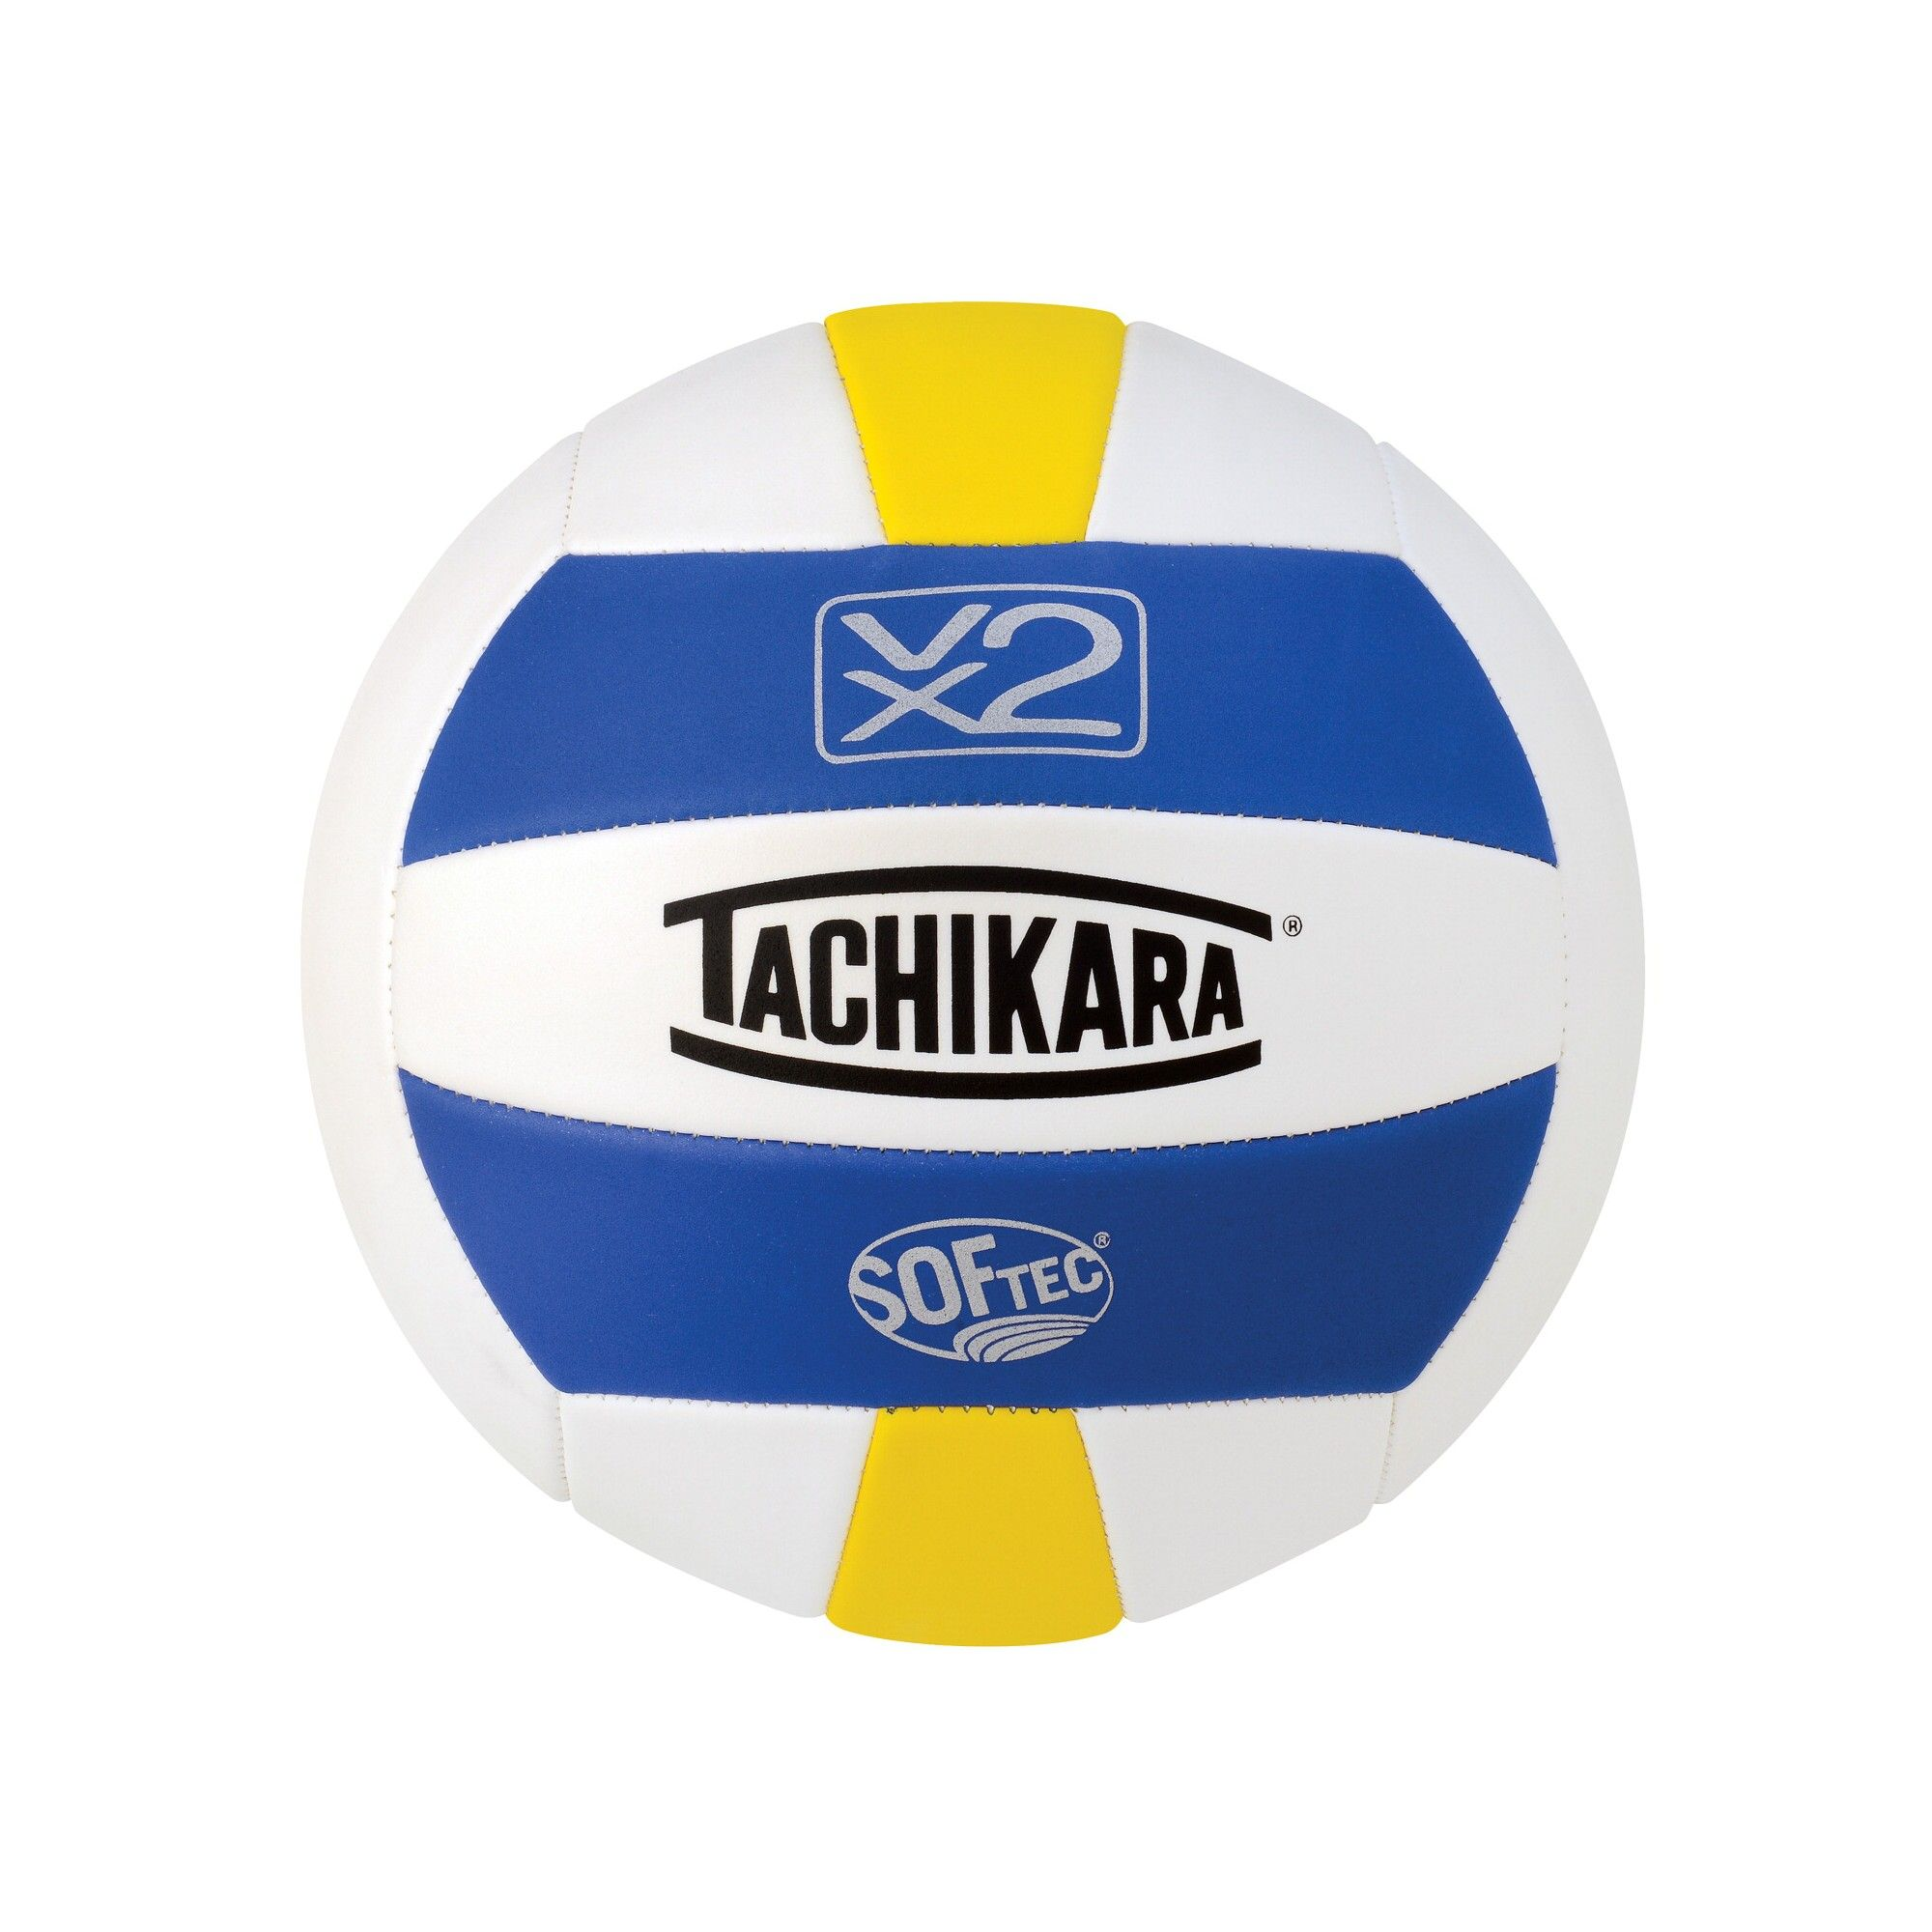 Tachikara Softec Vx2 Volleyball Royal White Yellow Volleyball Volleyballs For Sale Volleyball Online